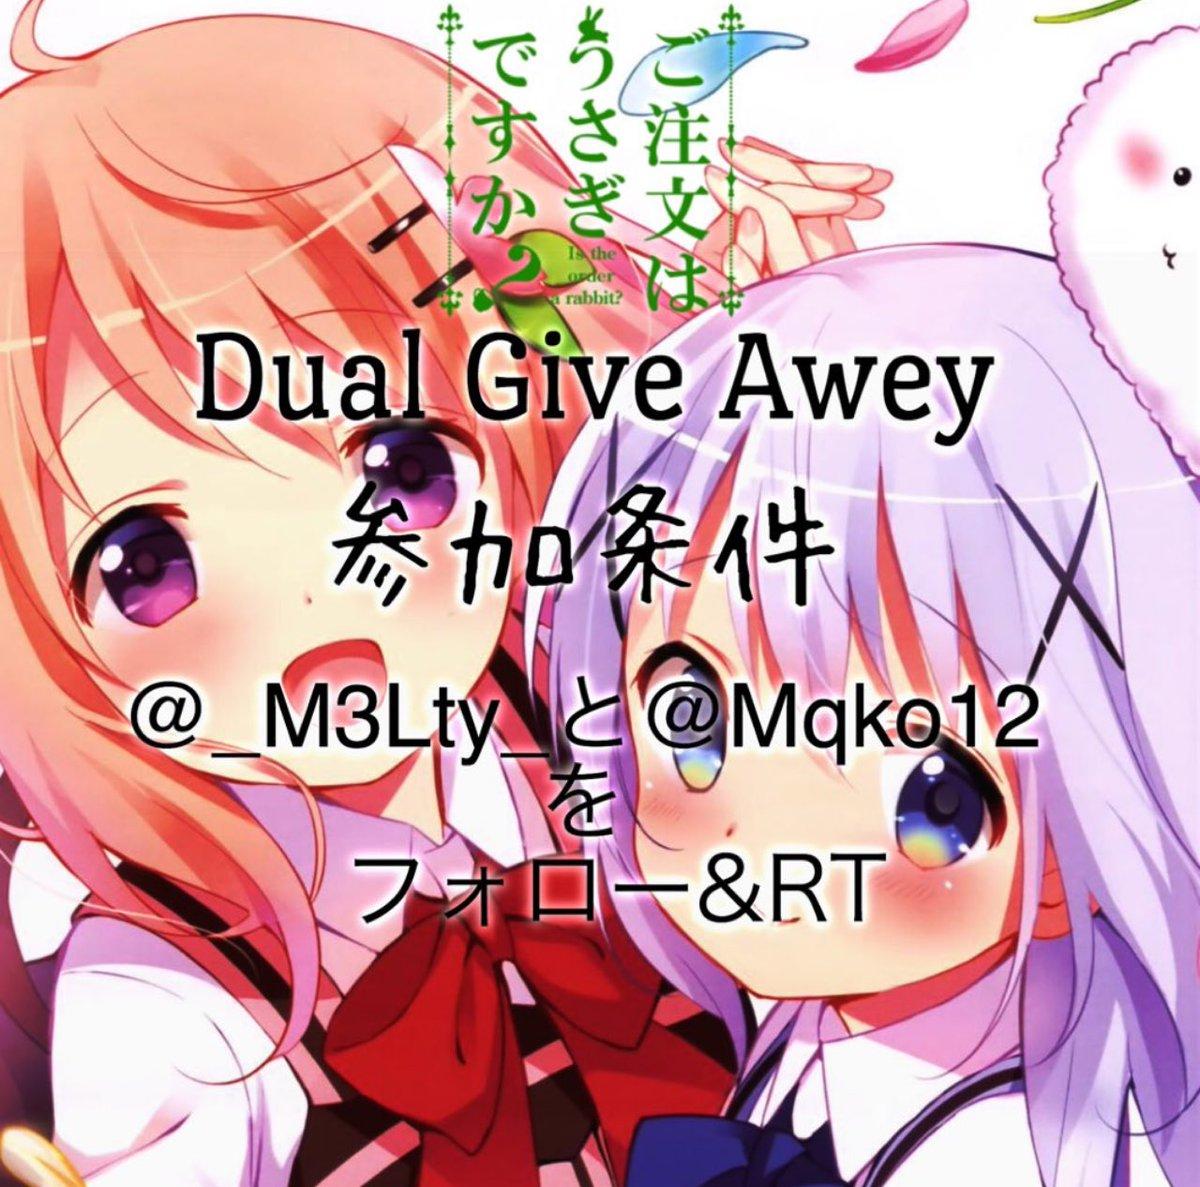 Dual Giveaway!!今回は冴えカノ←(みルキー)、とごちうさ←(ジャック)で作りました(*^^*)*参加条件・